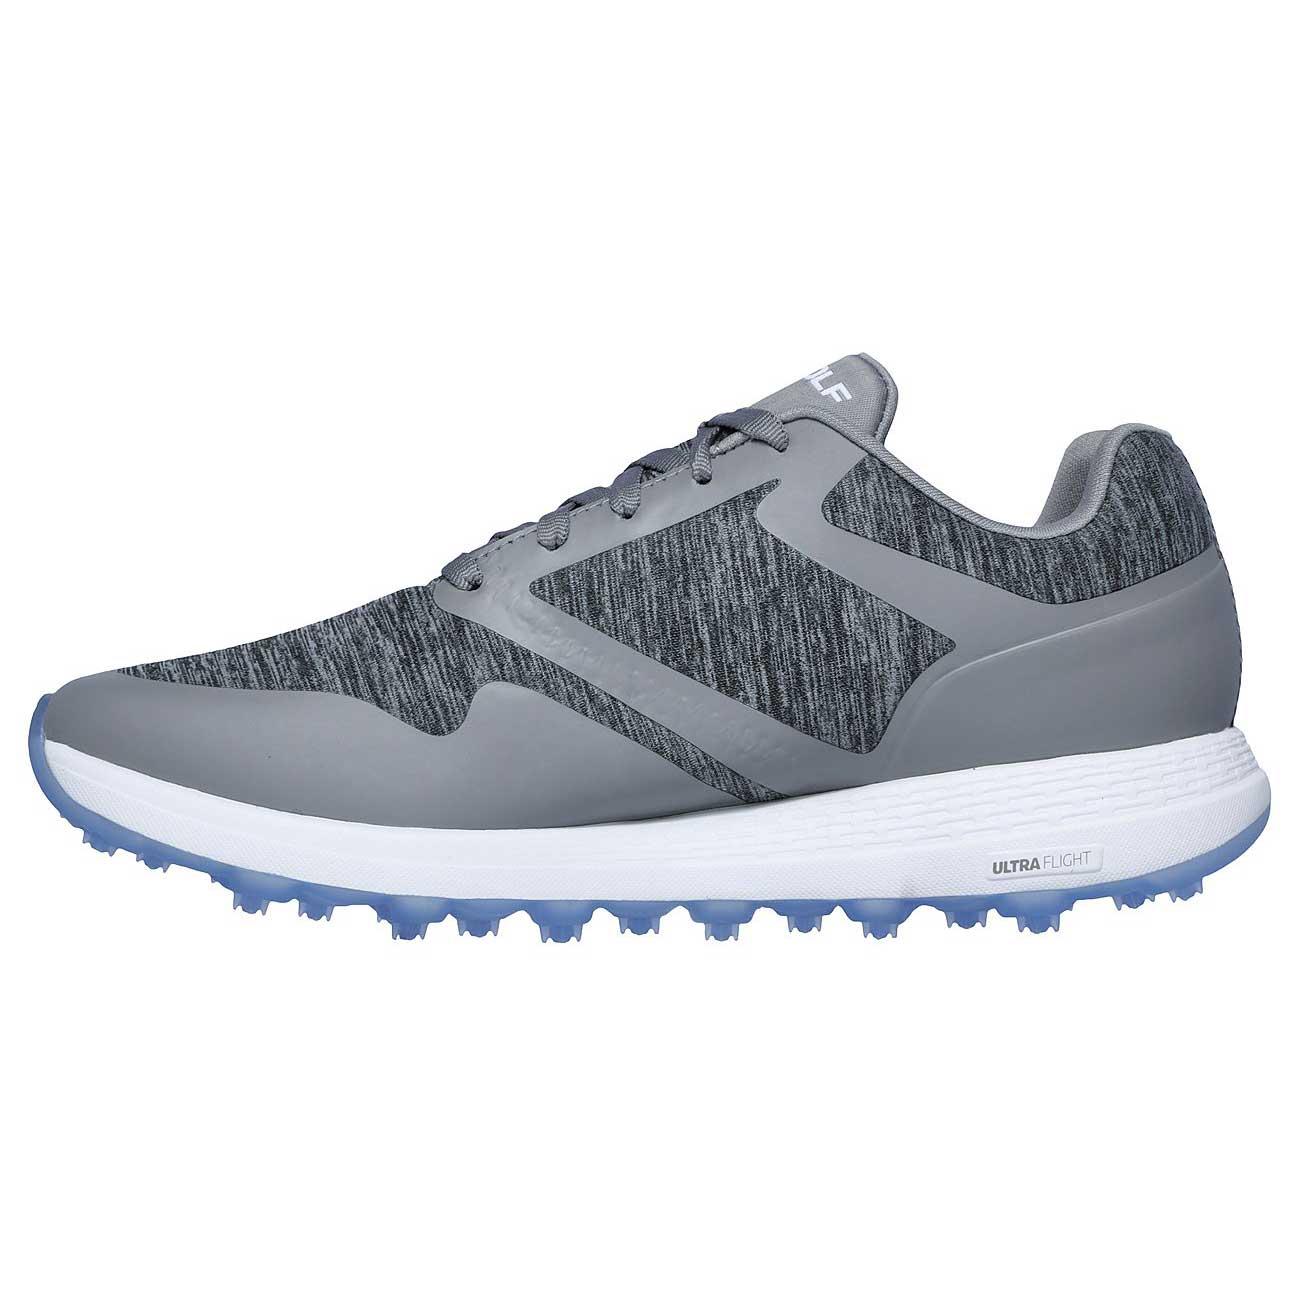 Skechers Women's Go Golf Max Cut Grey/Blue Golf Shoe